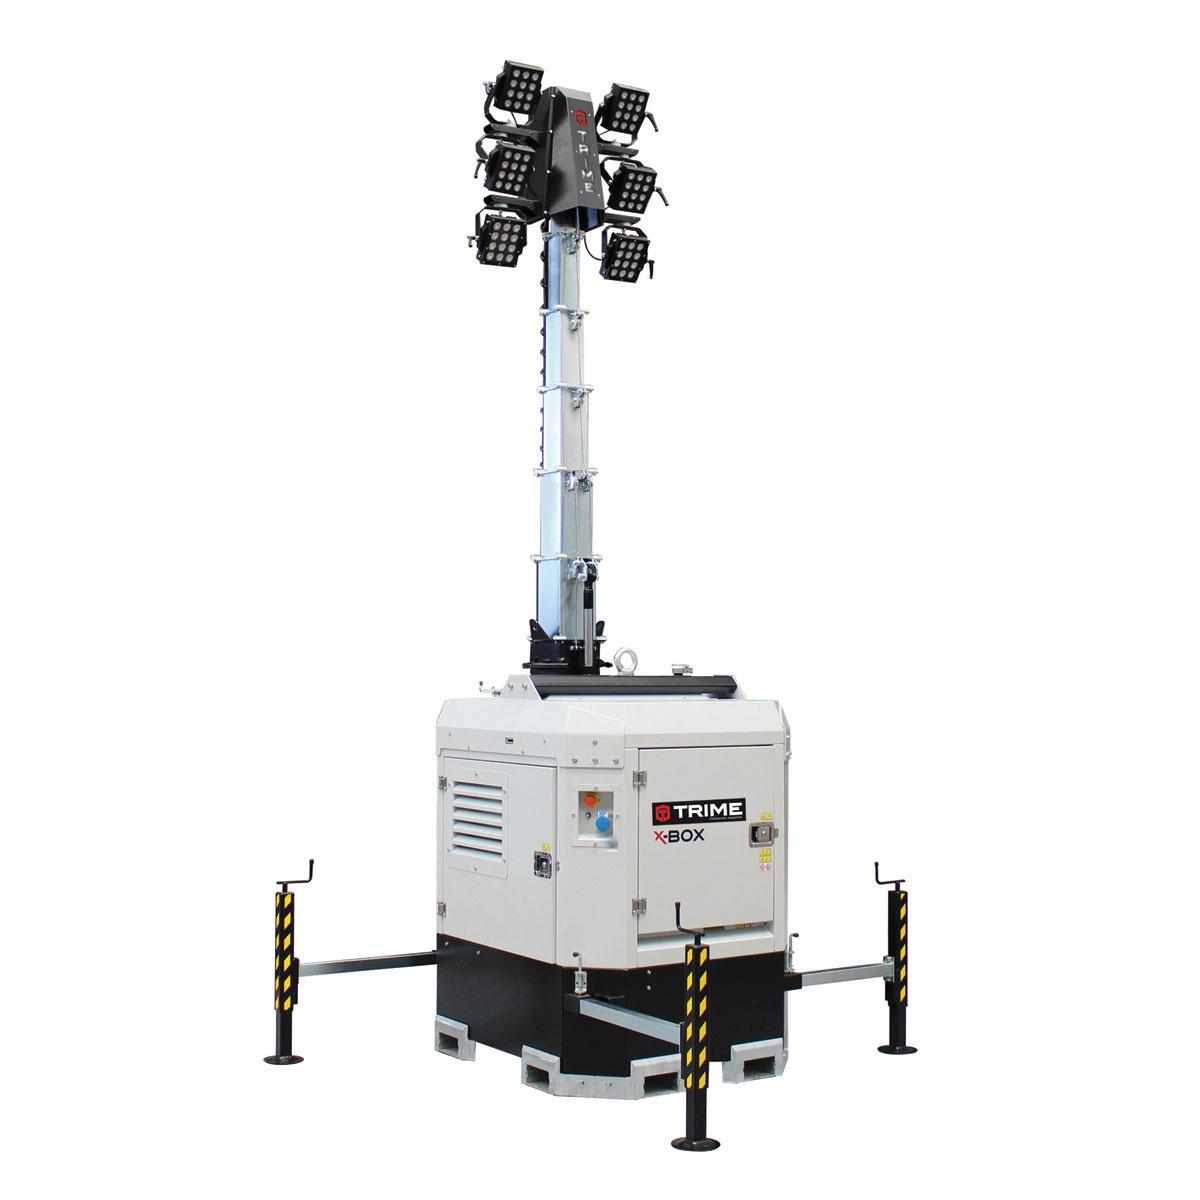 prozektoru-masts-led-x-box-6x150W-48V-atverta-pozicija